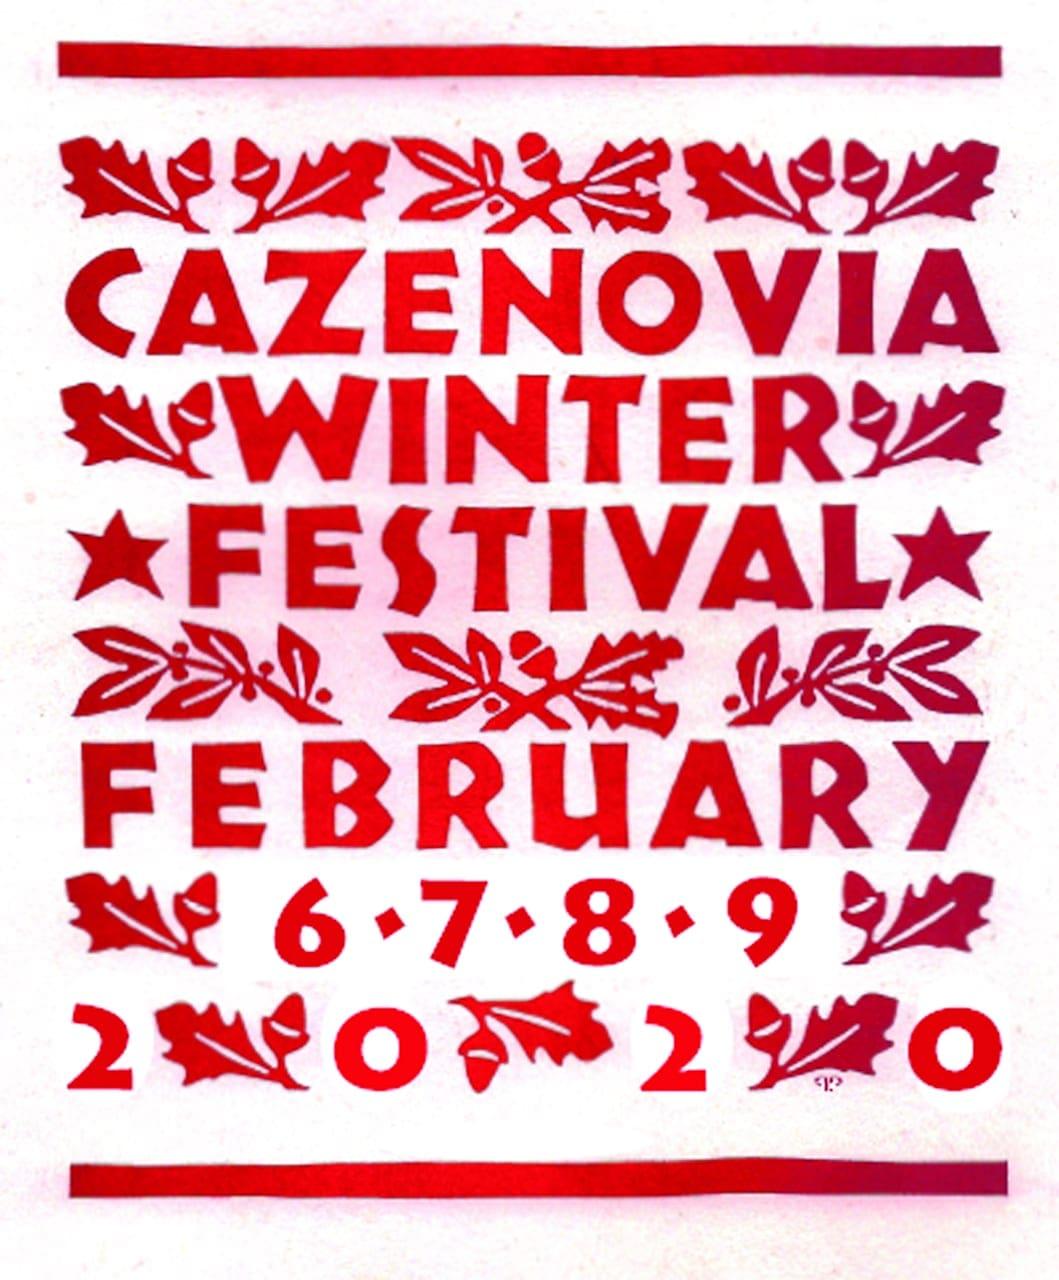 Cazenovia Christmas Walk 2020 Cazenovia celebrates the season with annual Winter Fest – Eagle